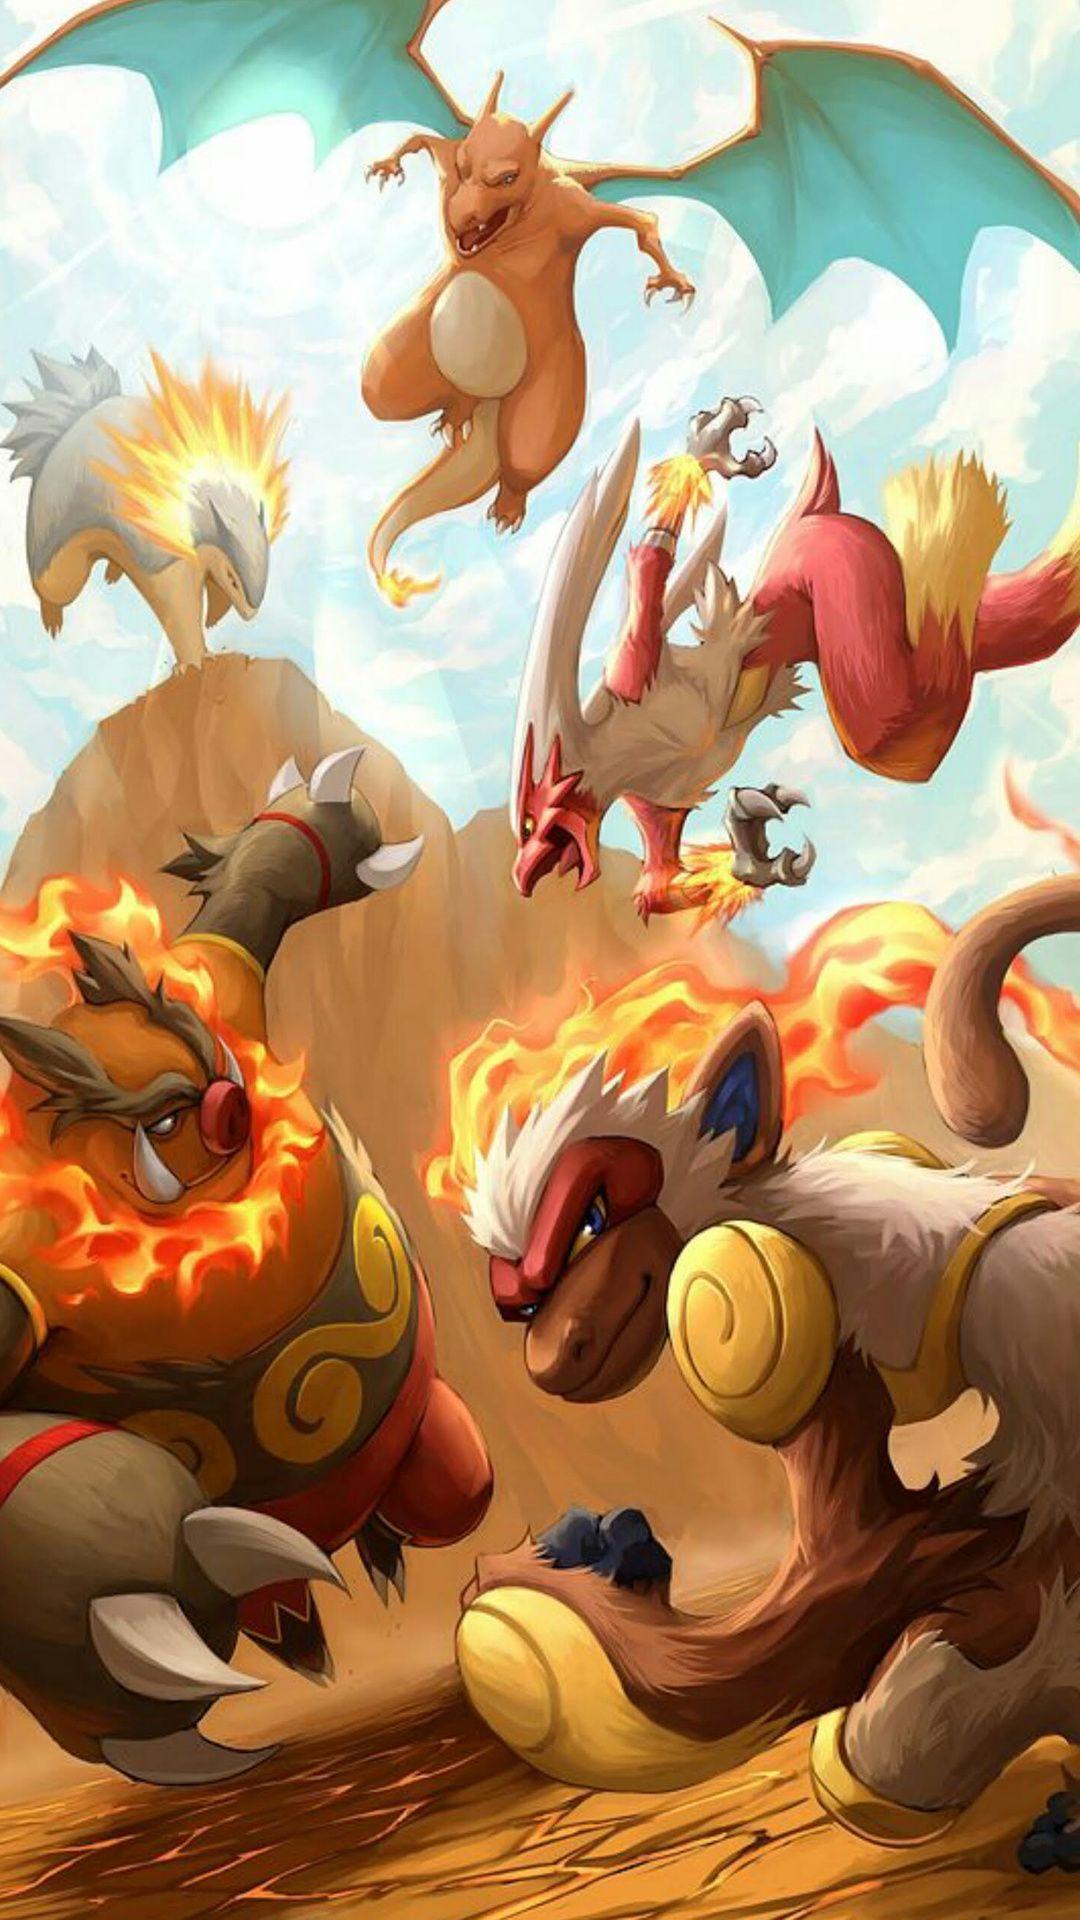 Legendary Pokemon Wallpaper Iphone Background Hupages Download Iphone Wallpapers Pokemon Pokemon Starters Fire Type Pokemon